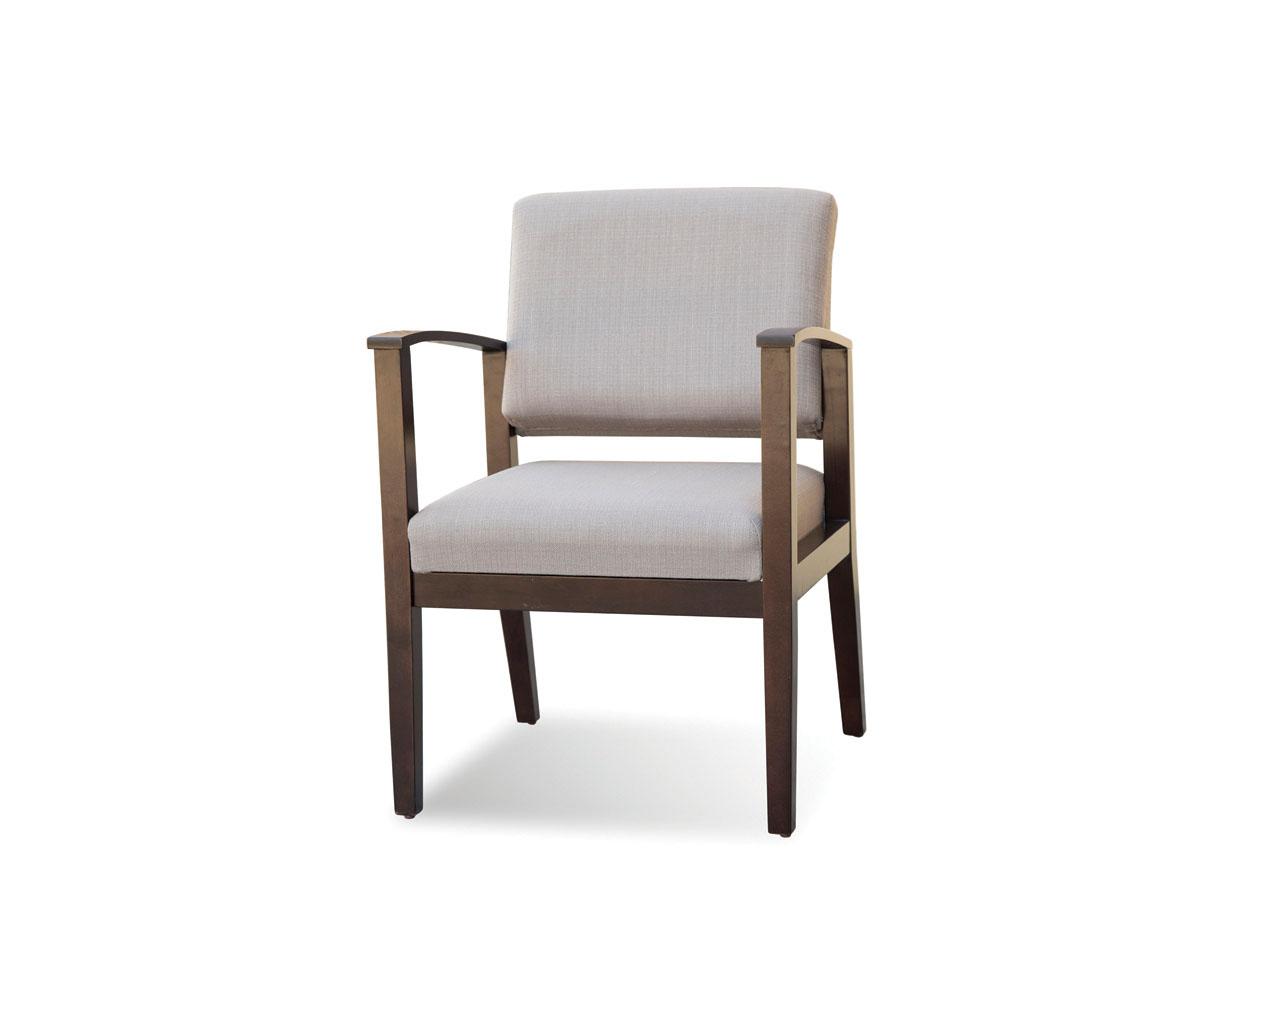 Morley Wood Guest Chair